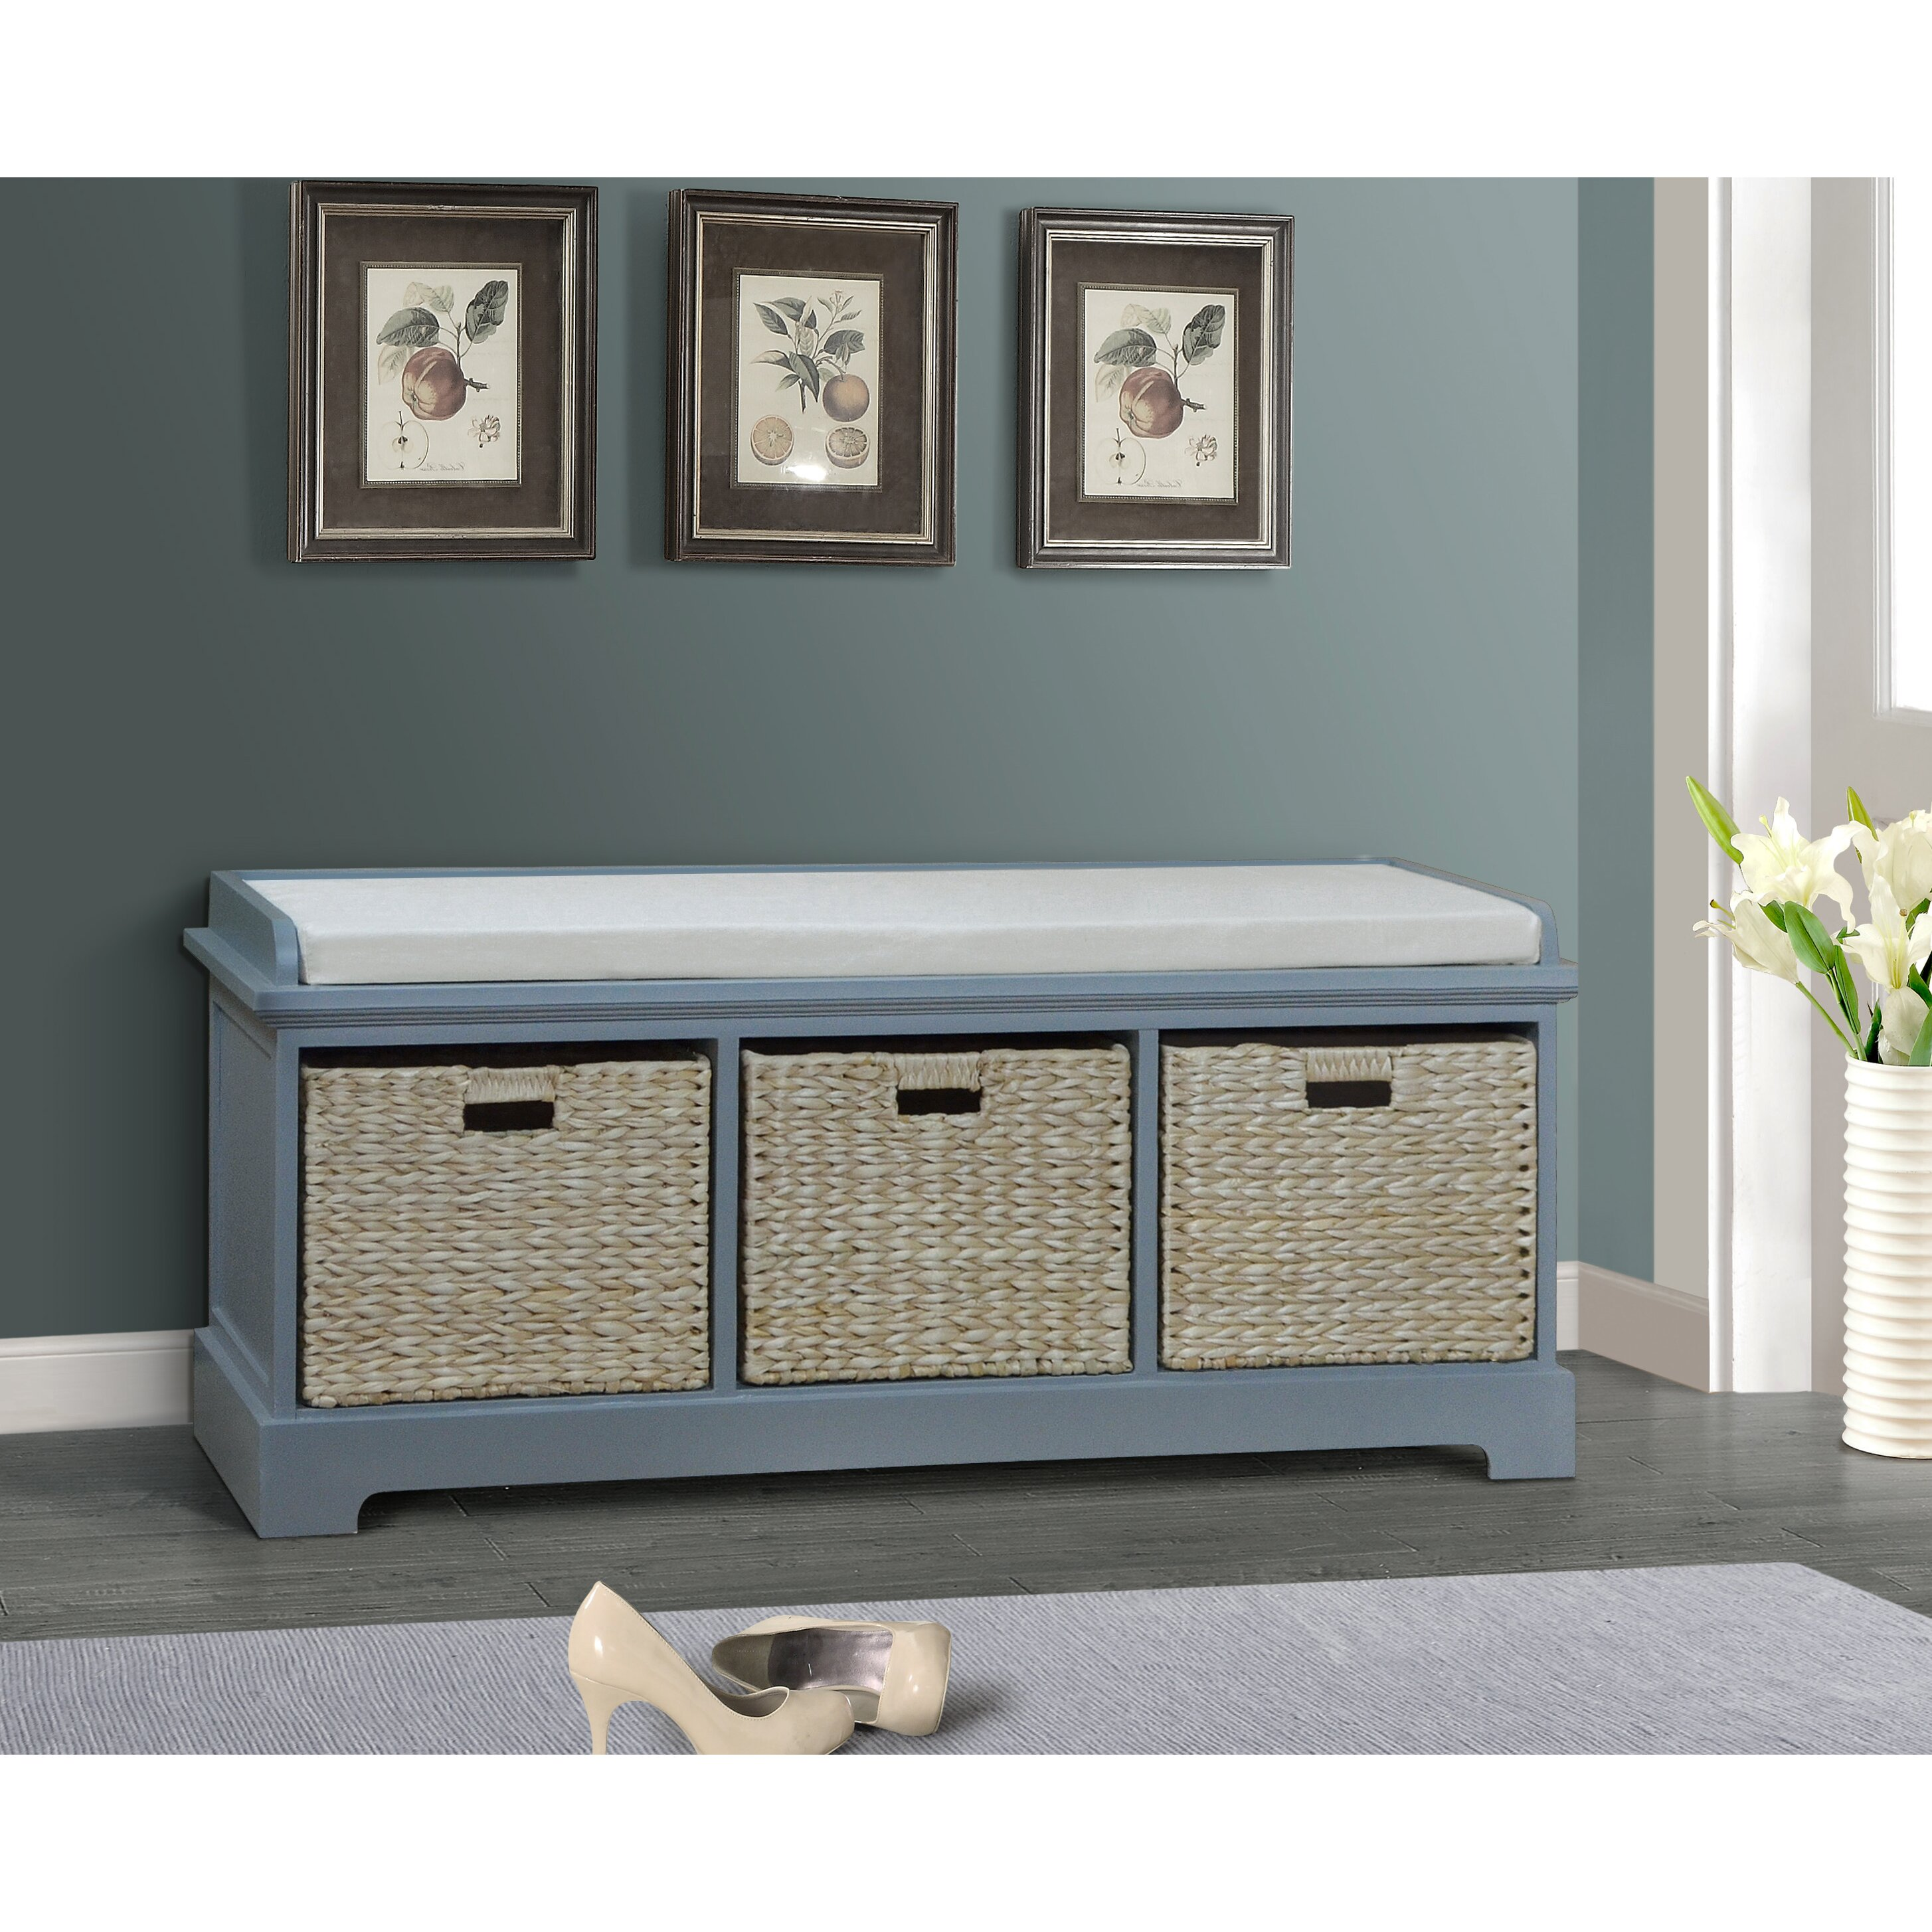 Trent Austin Design Clayera Wooden Bedroom Storage Bench with 3 Baskets &